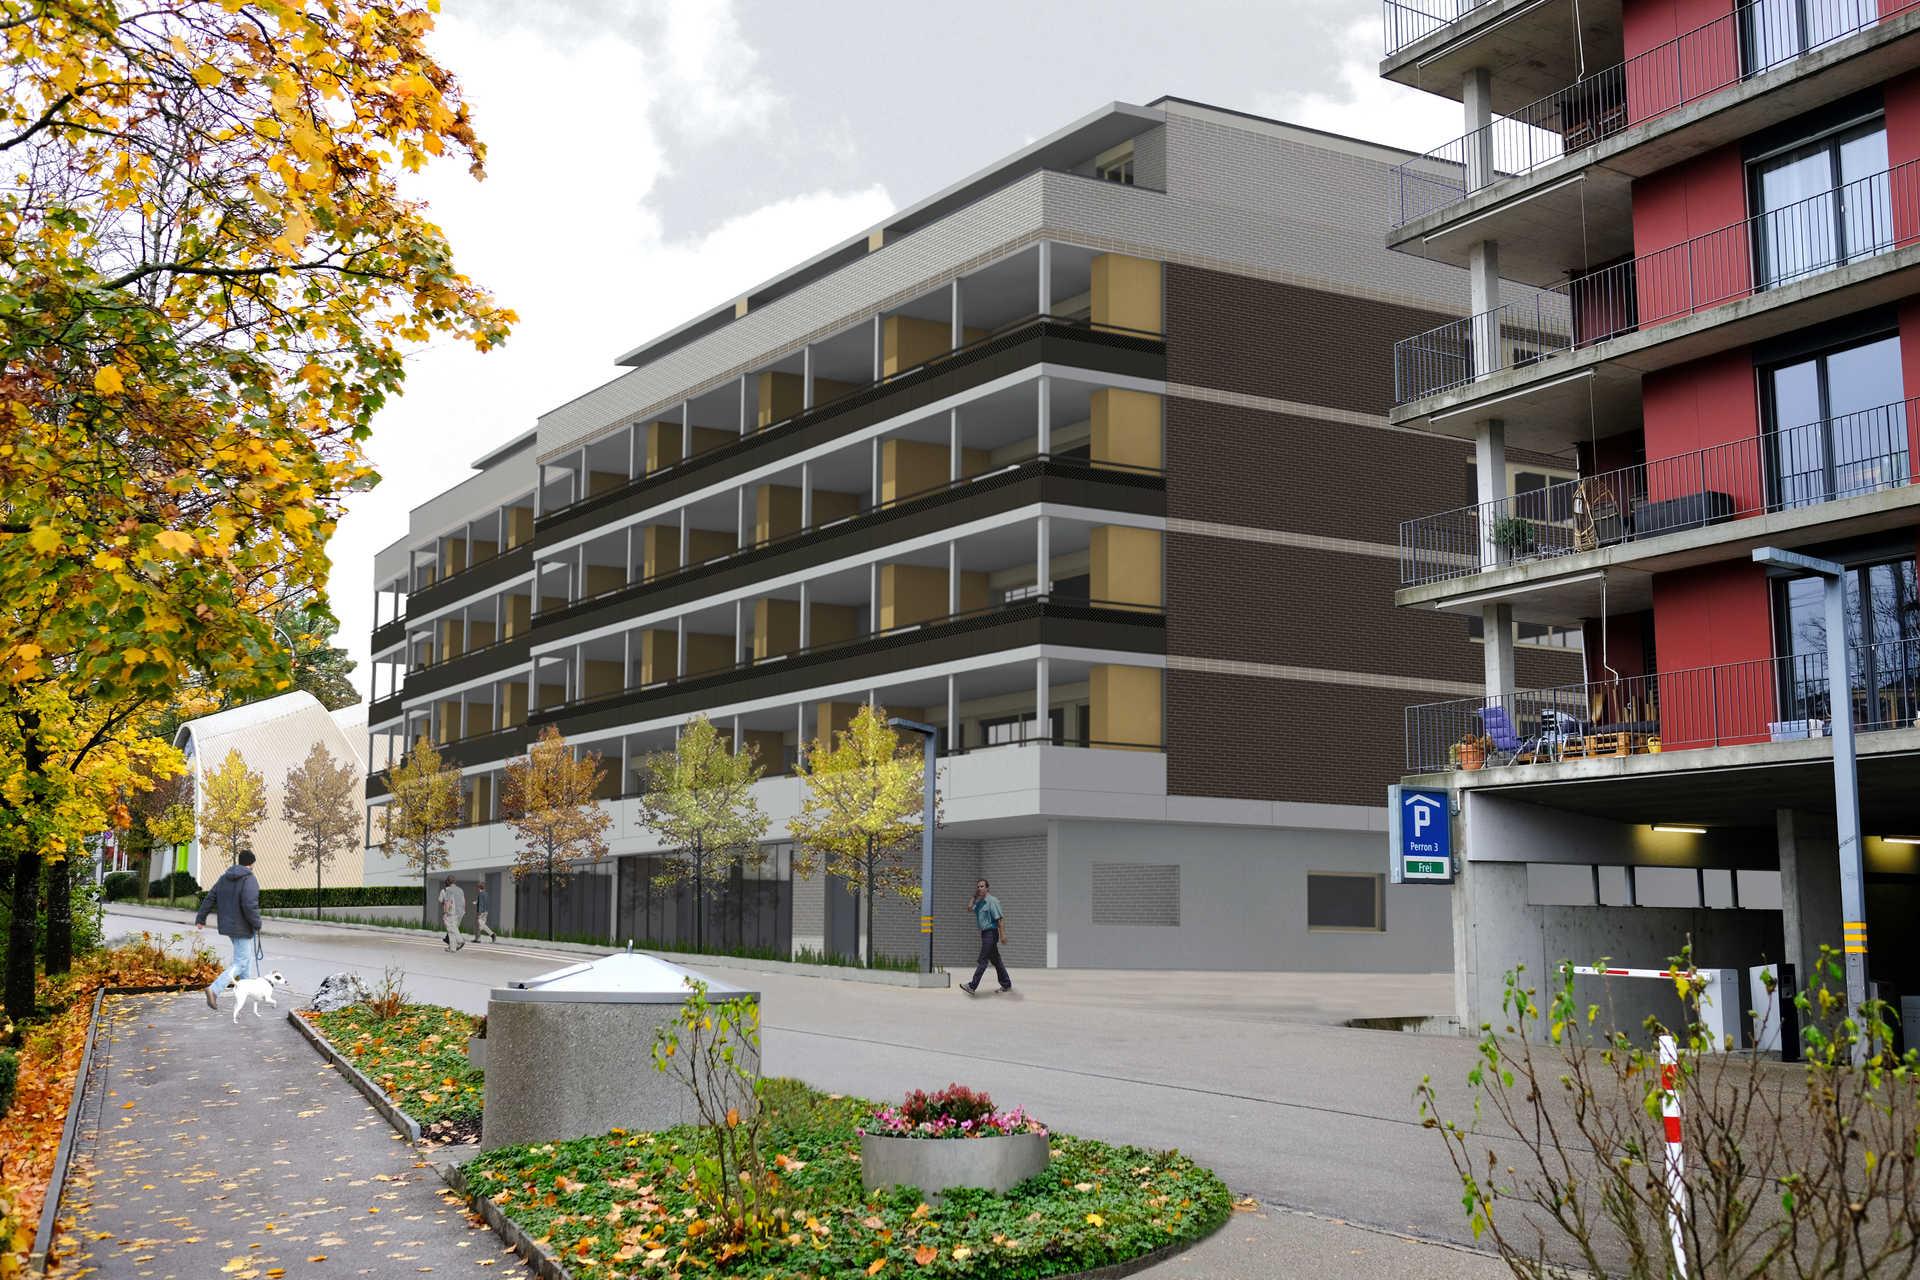 SNP Stadtbühl Gossau SG   35 Wohnungen / Erdgeschoss Gewerbe   PKTG